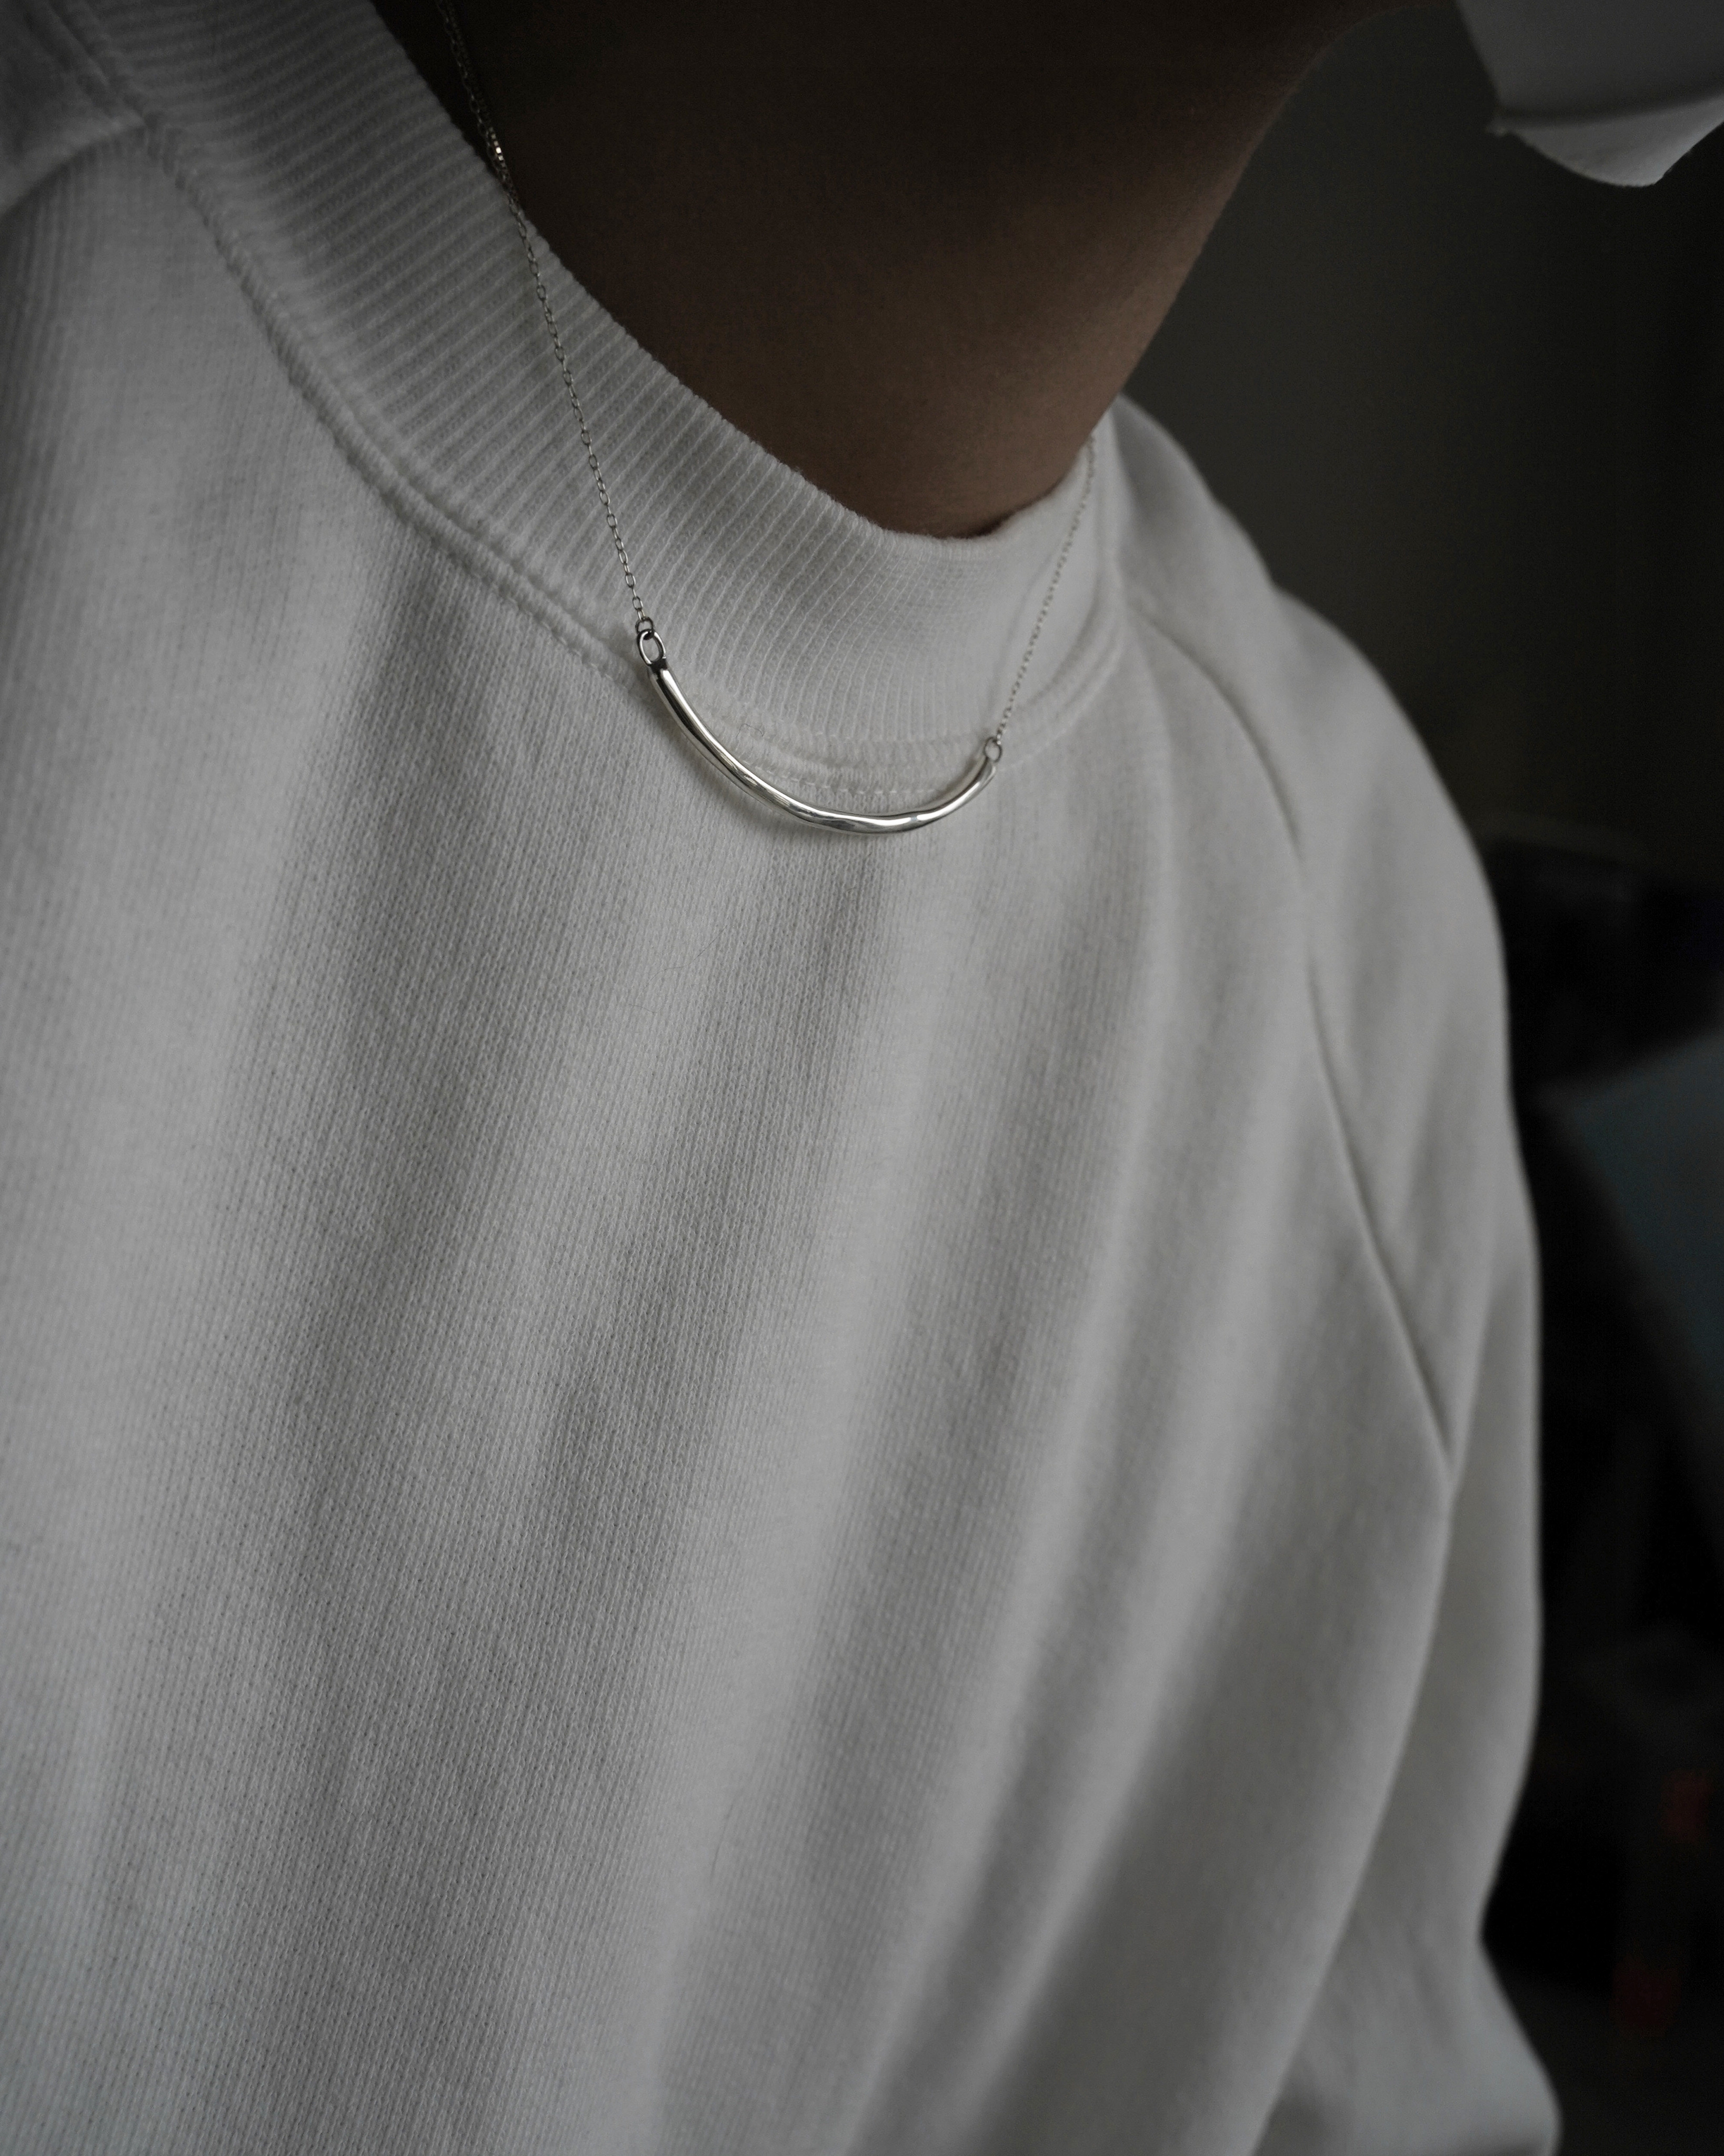 新作発売:raw necklace